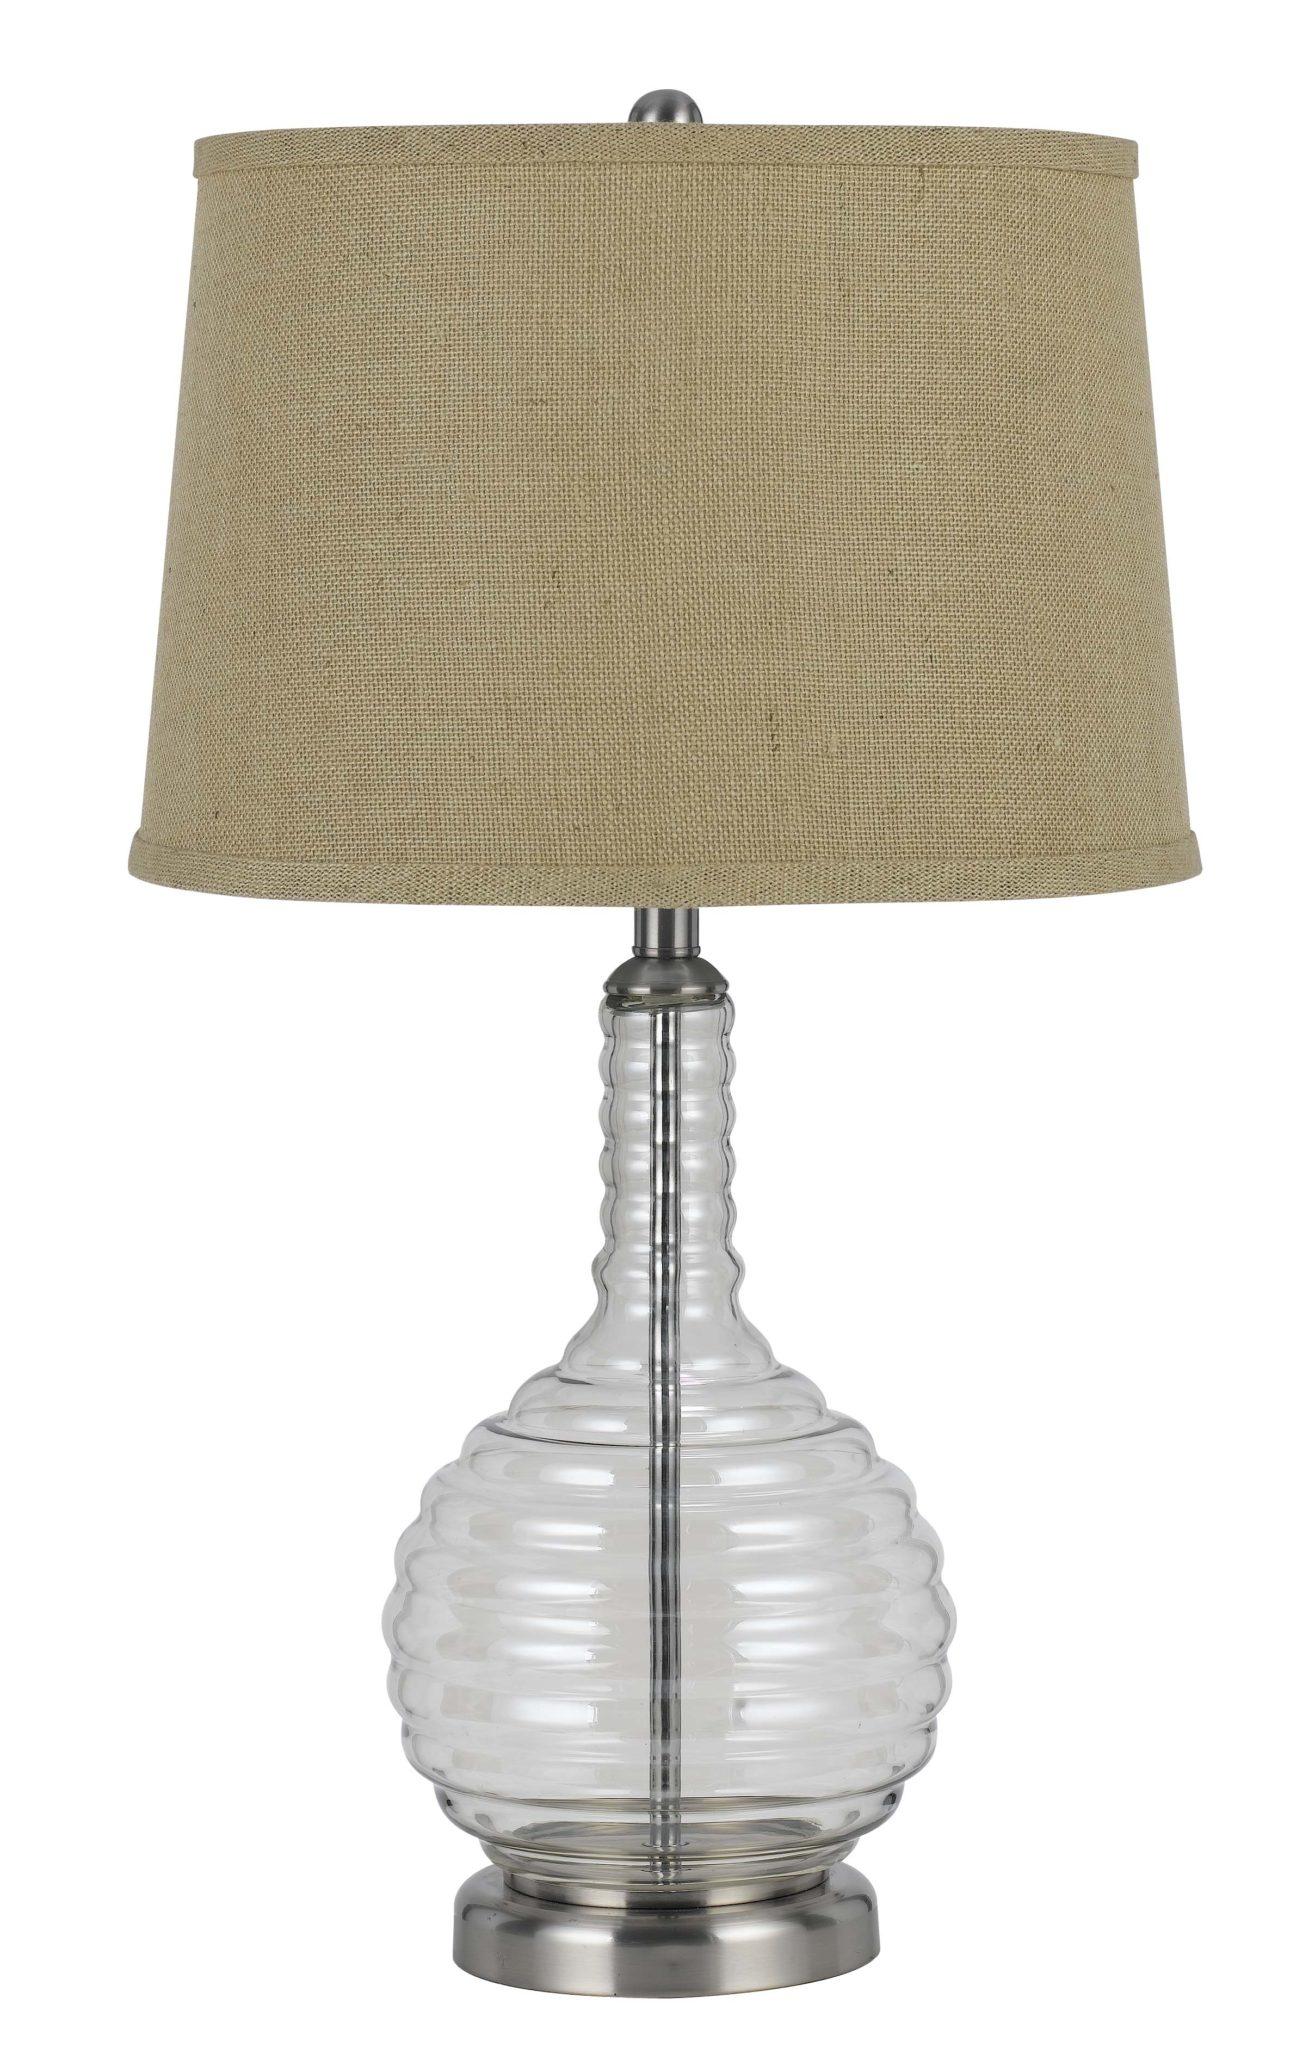 150w 3 Way Gl Table Lamp